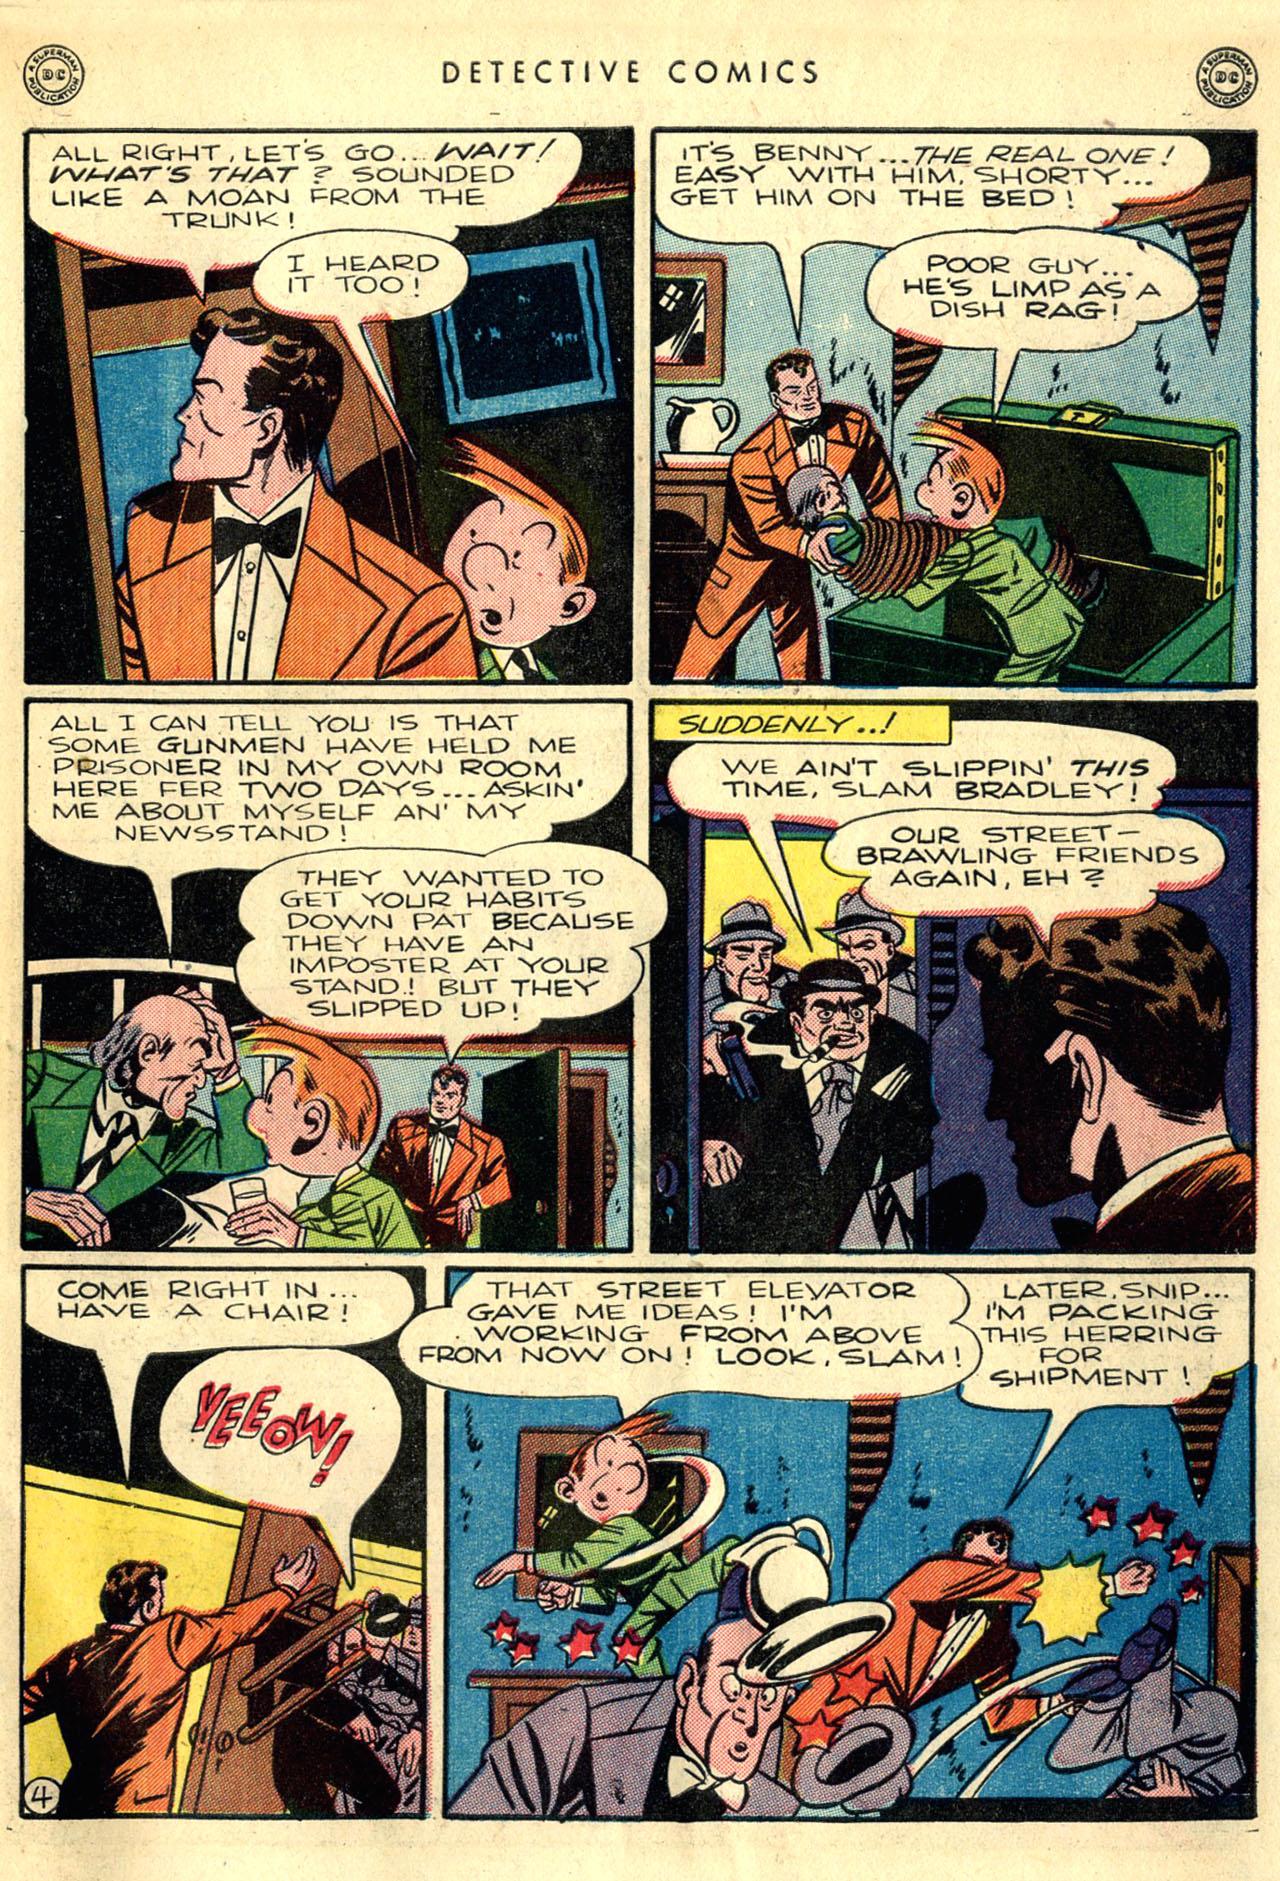 Read online Detective Comics (1937) comic -  Issue #90 - 45